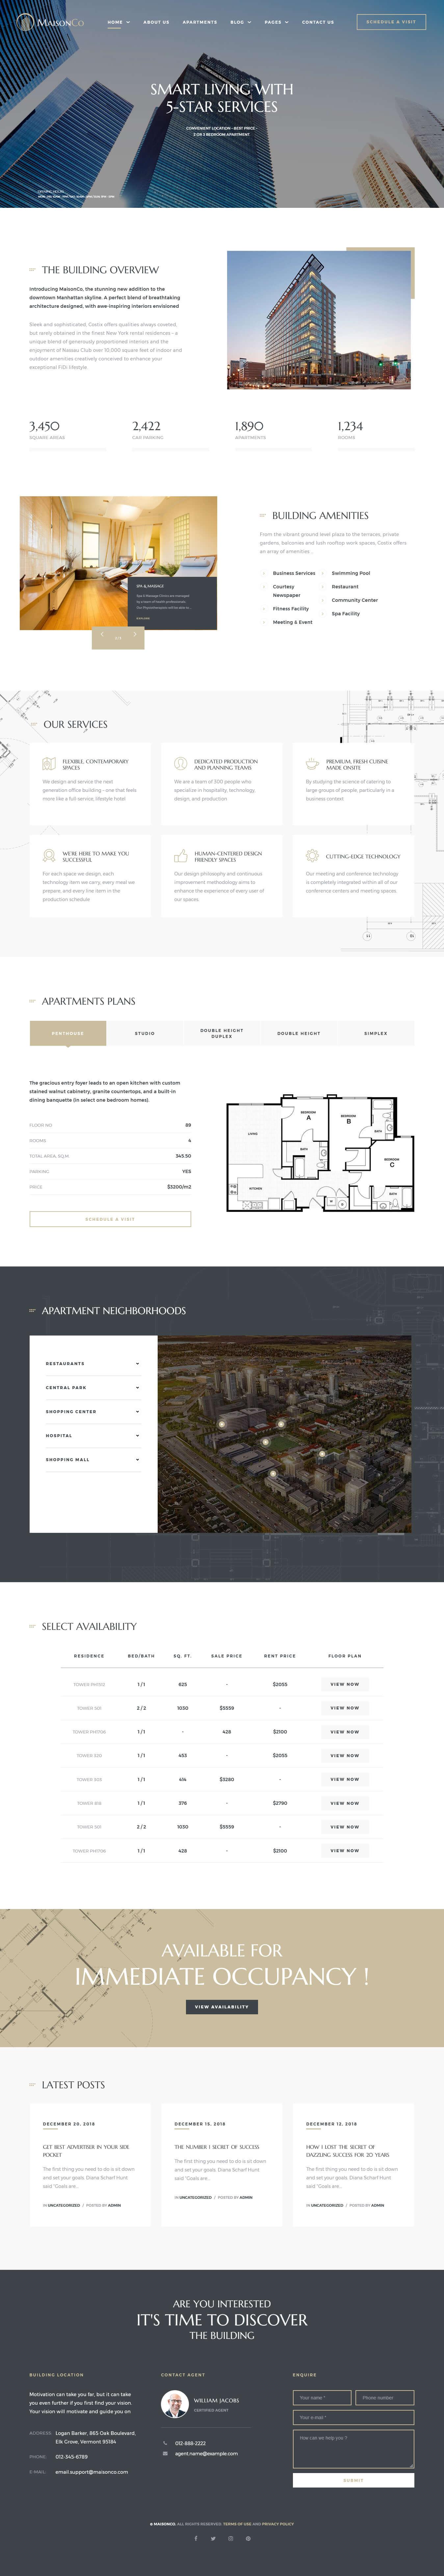 maisonco best premium home rental property wordpress theme - 10+ Best Premium Home Rental and Property WordPress Themes